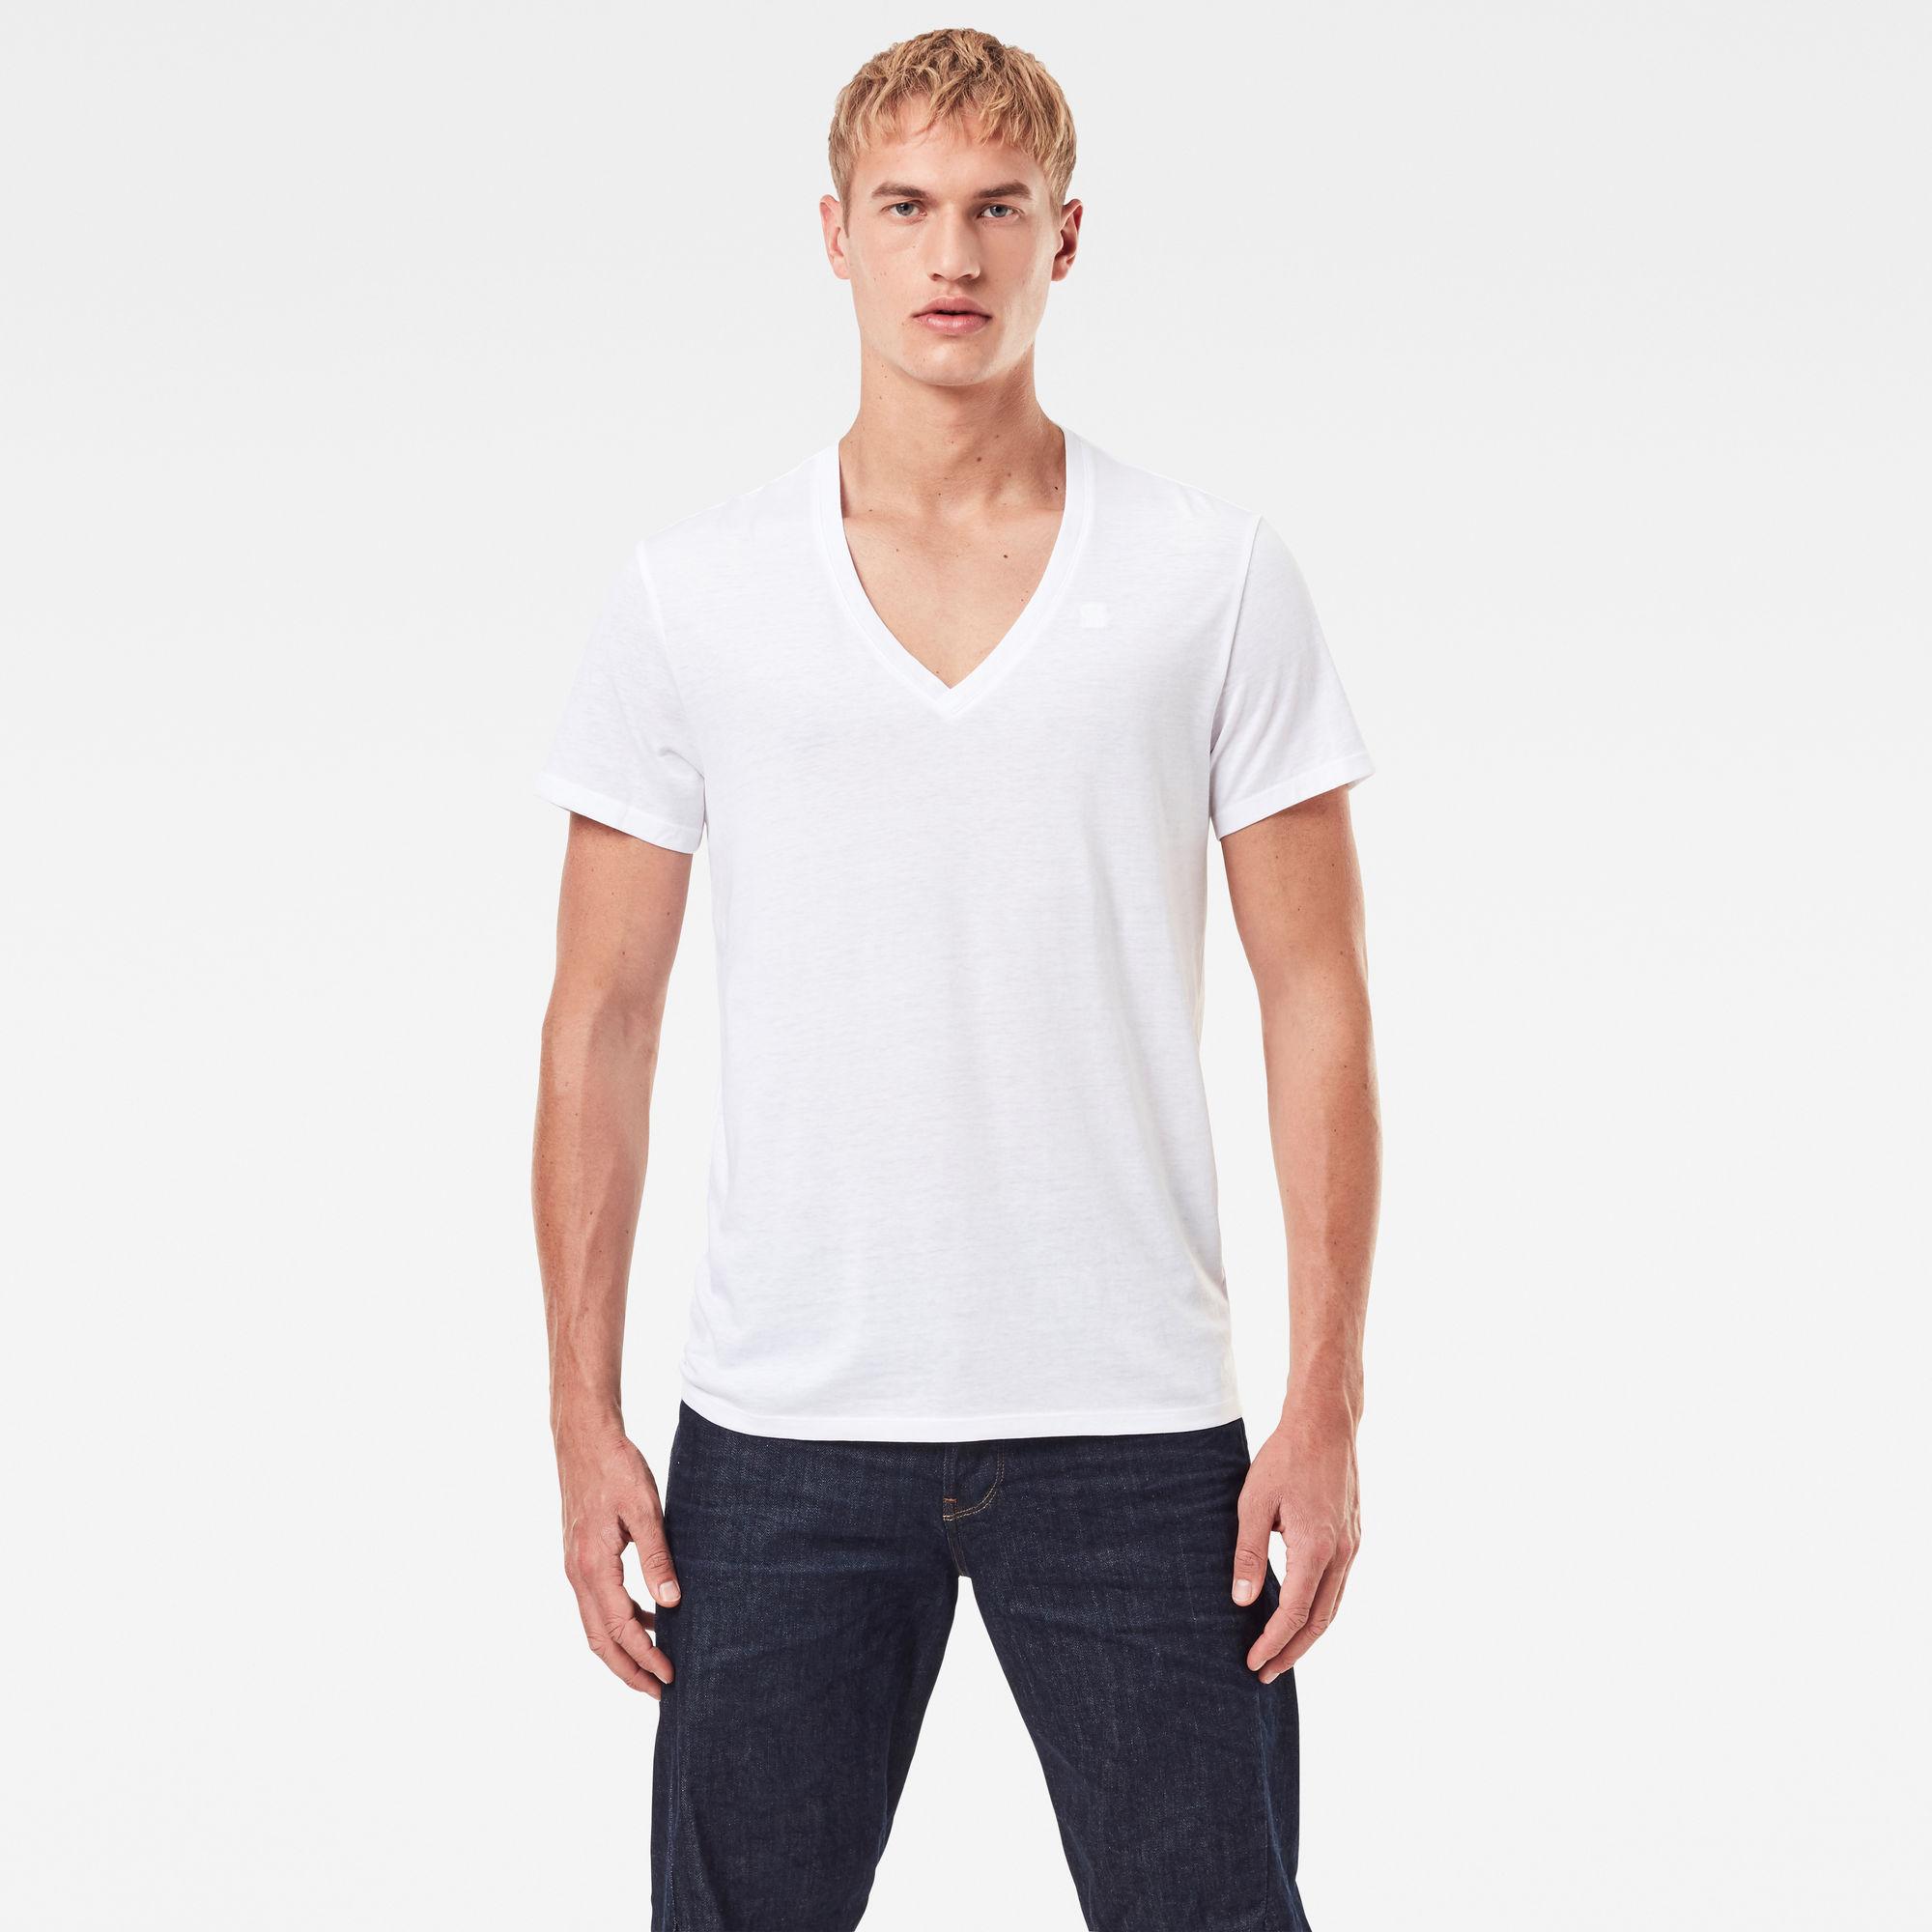 G-Star RAW Heren Basic Heather T-Shirt 2-Pack Wit